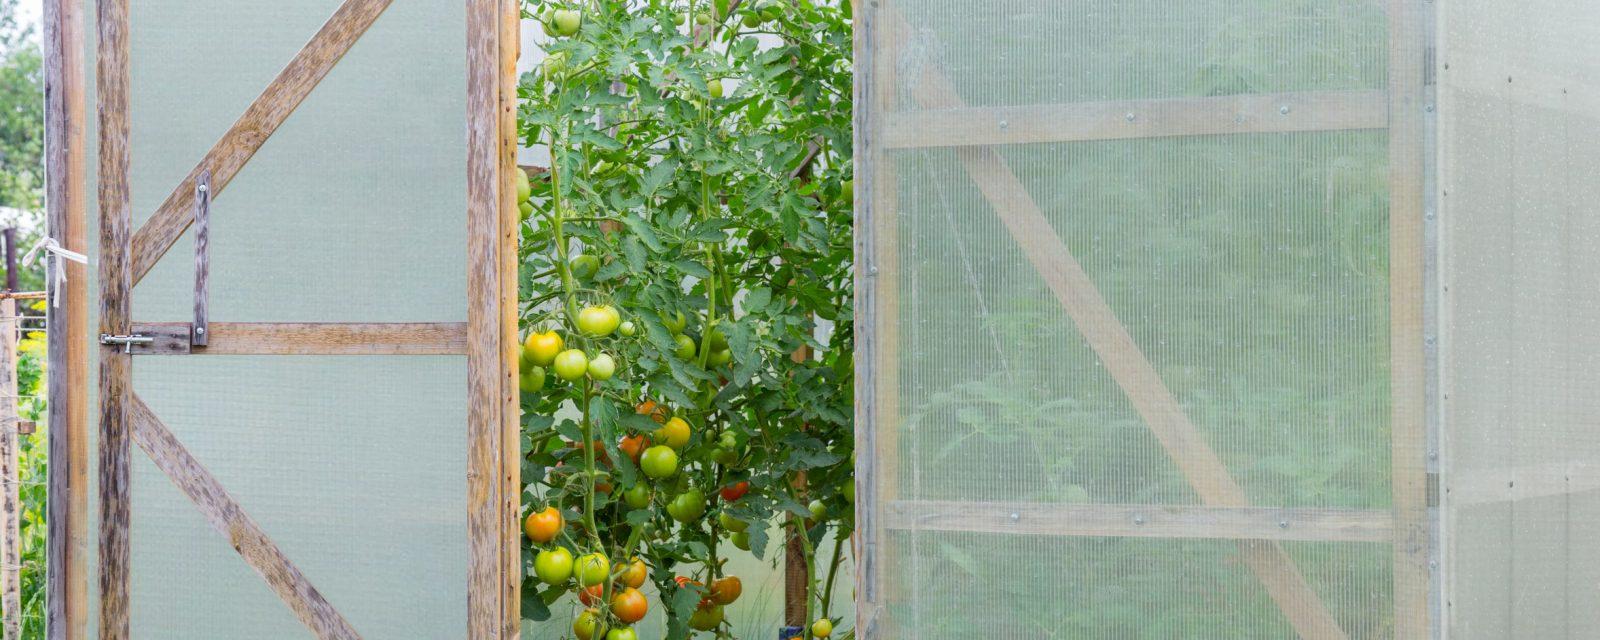 Grid film on greenhouse